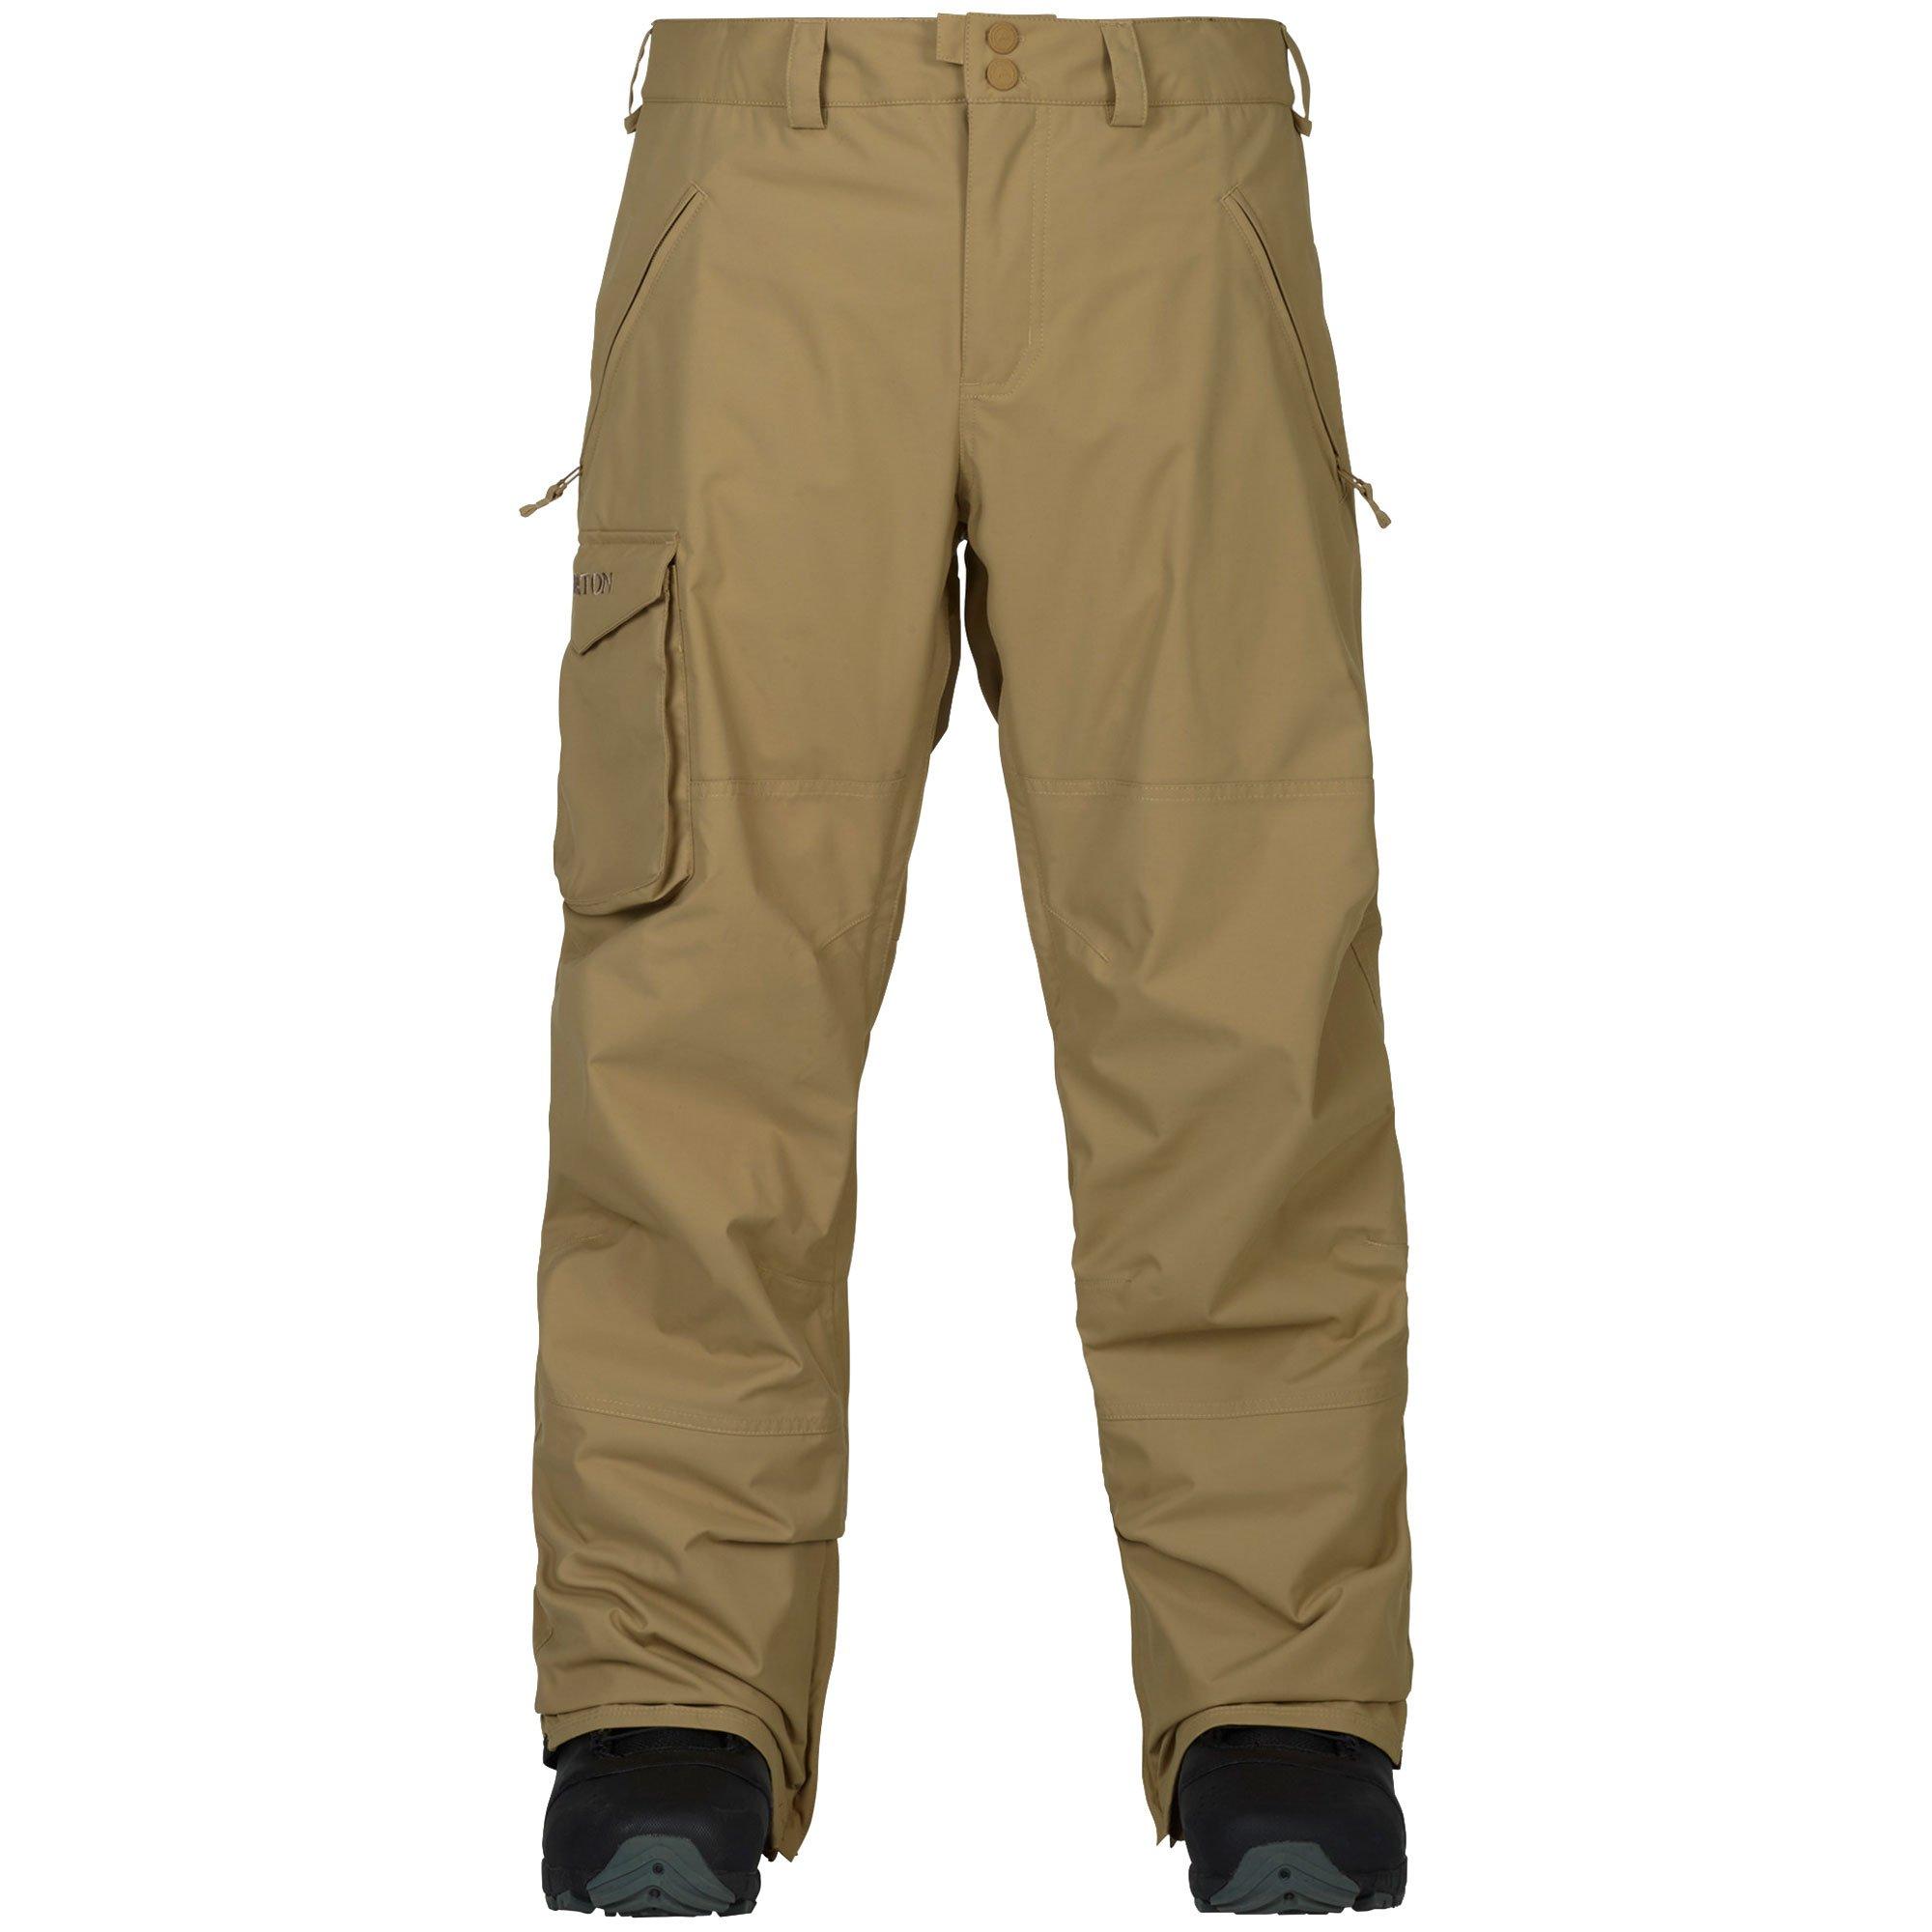 Burton - Mens Covert Insulated Snow Pants 2018, Kelp, XXS by Burton